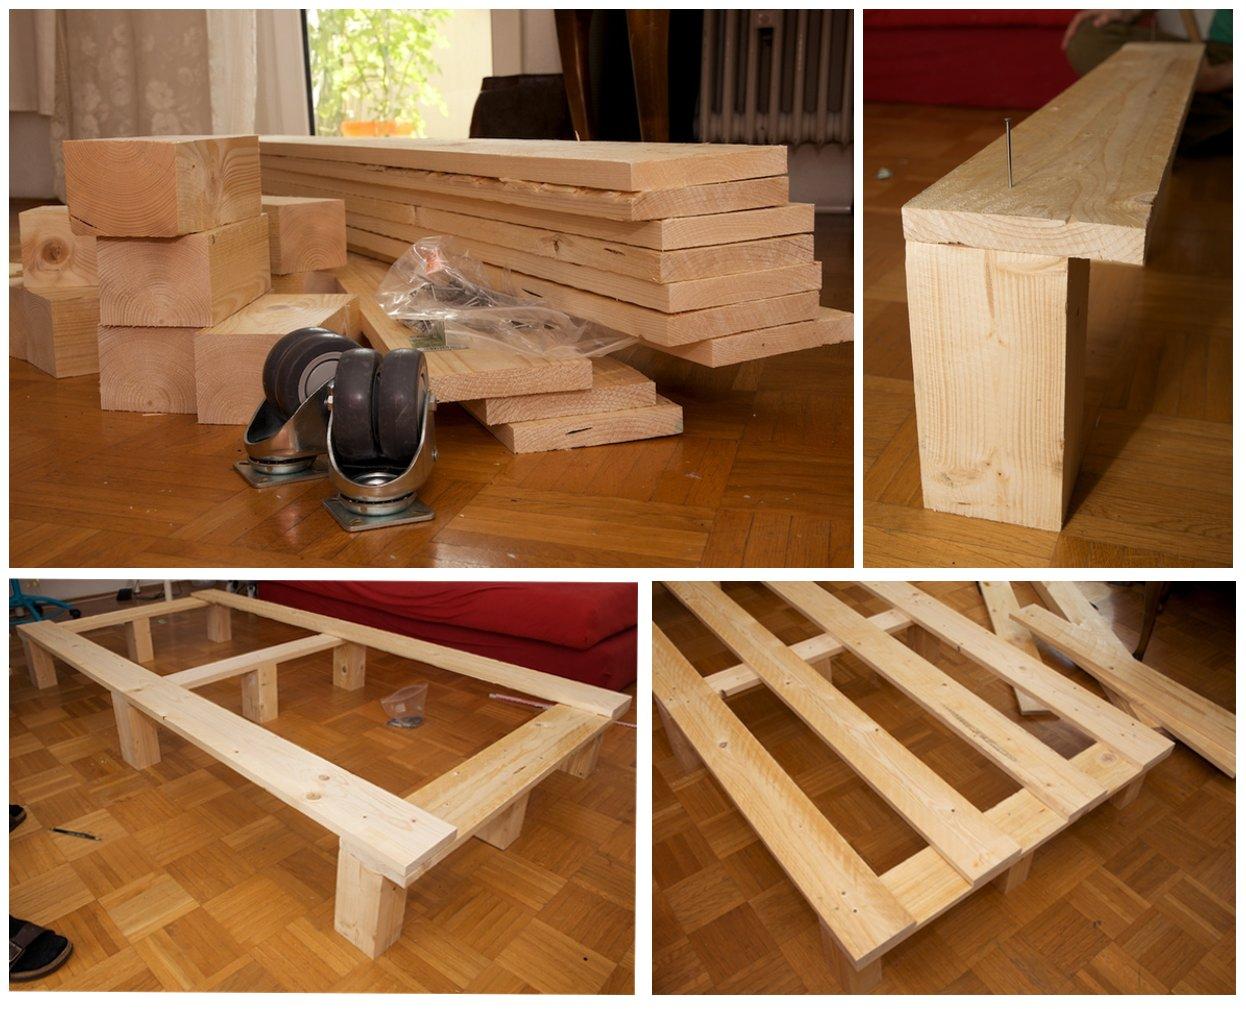 diy sofa mit stauraum waehnerk. Black Bedroom Furniture Sets. Home Design Ideas